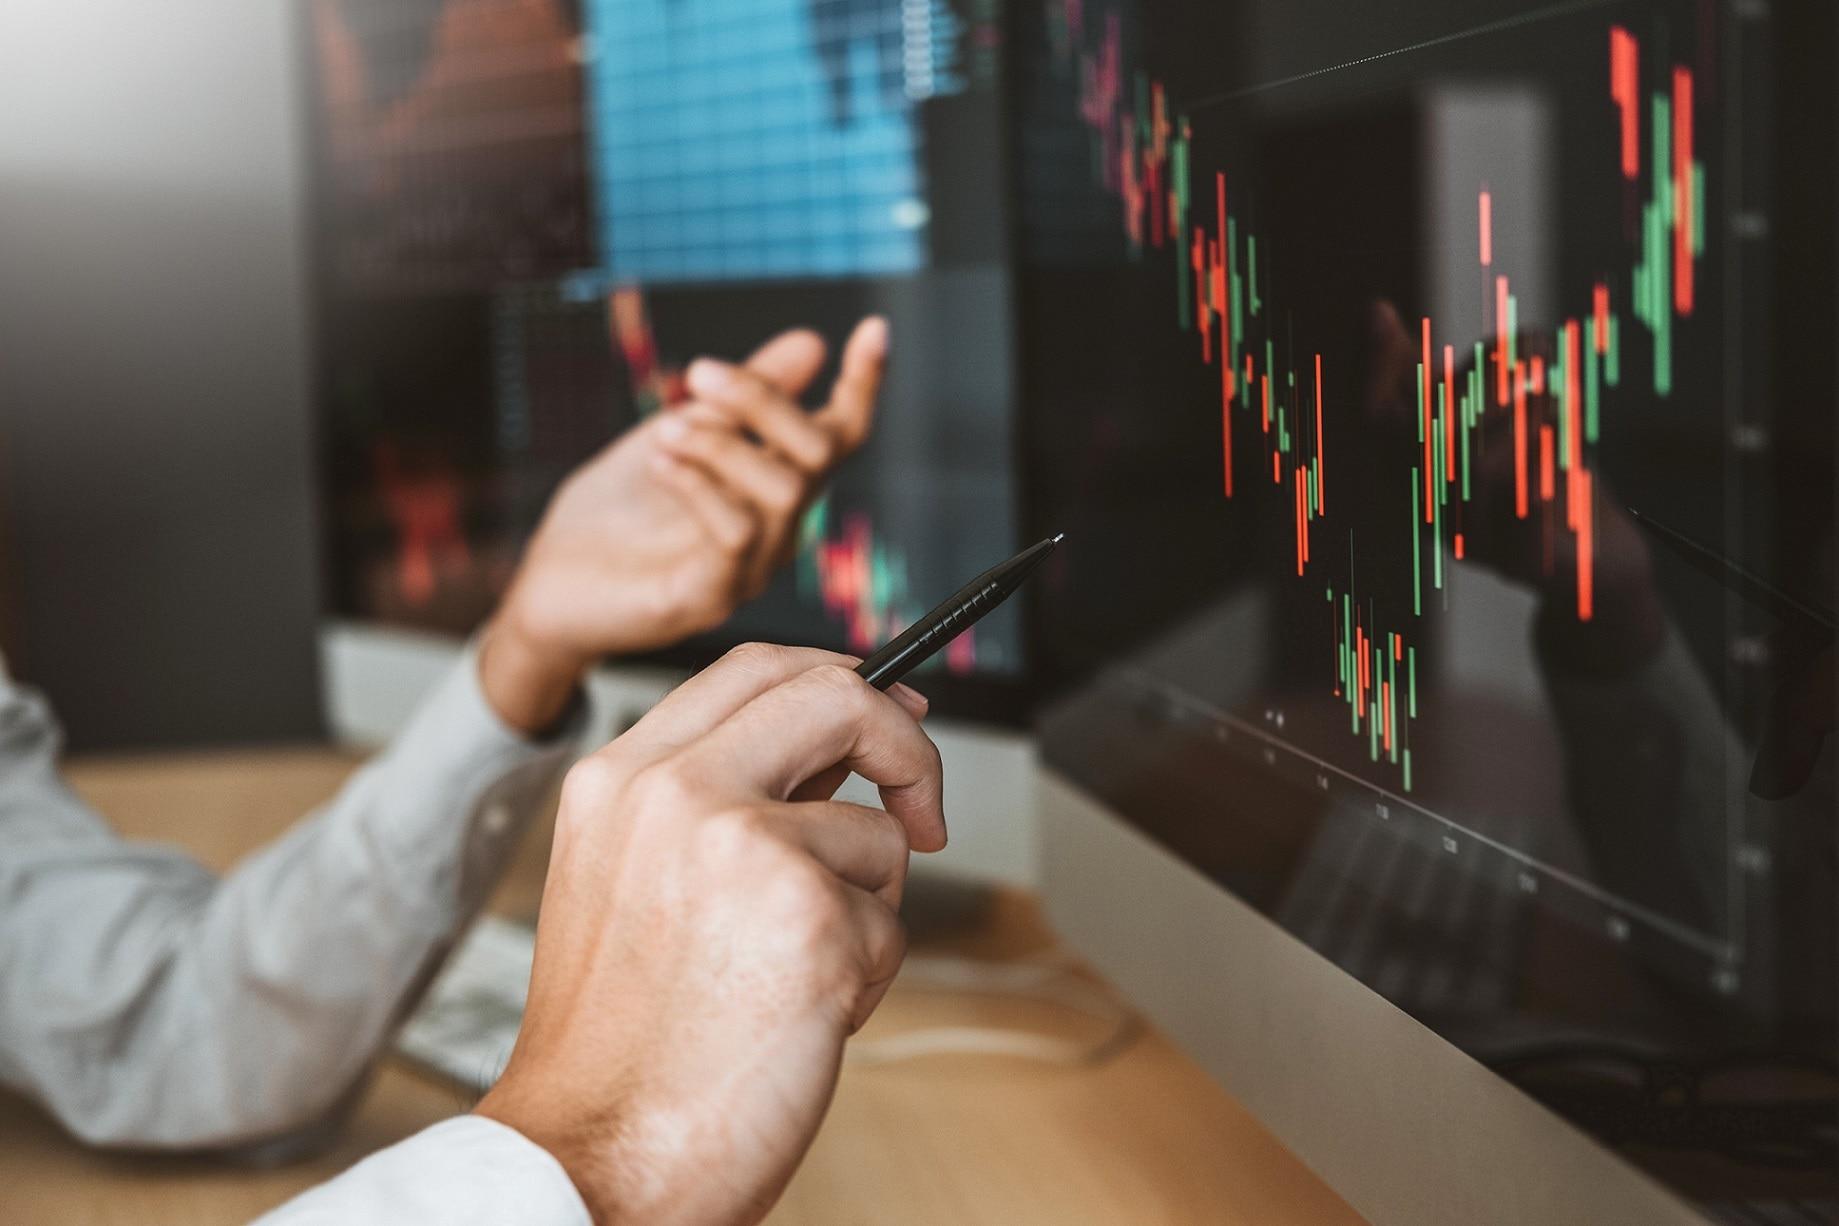 mercado bursatil